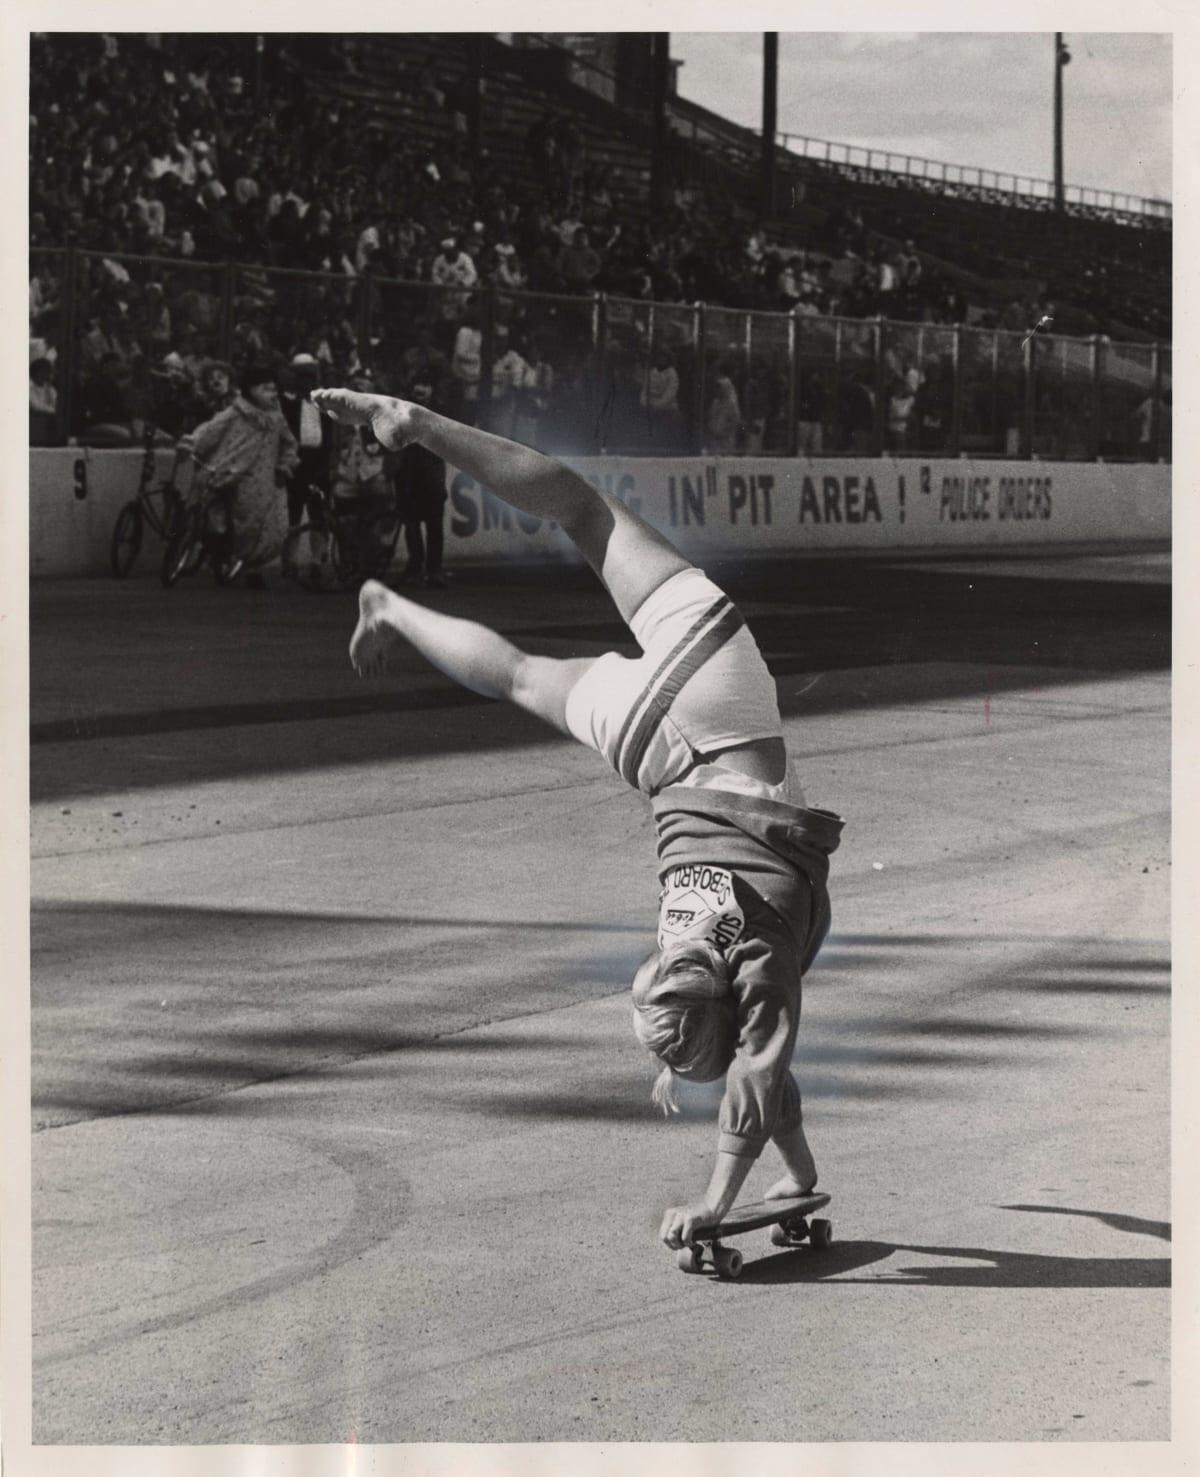 https://artlogic-res.cloudinary.com/w_1200,c_limit,f_auto,fl_lossy,q_auto/artlogicstorage/dollc/images/view/adbb138b8cccfa5228005482534660f7j/daniel-oliver-patti-mcgee-skateboarding-s-first-female-pro-1965.jpg